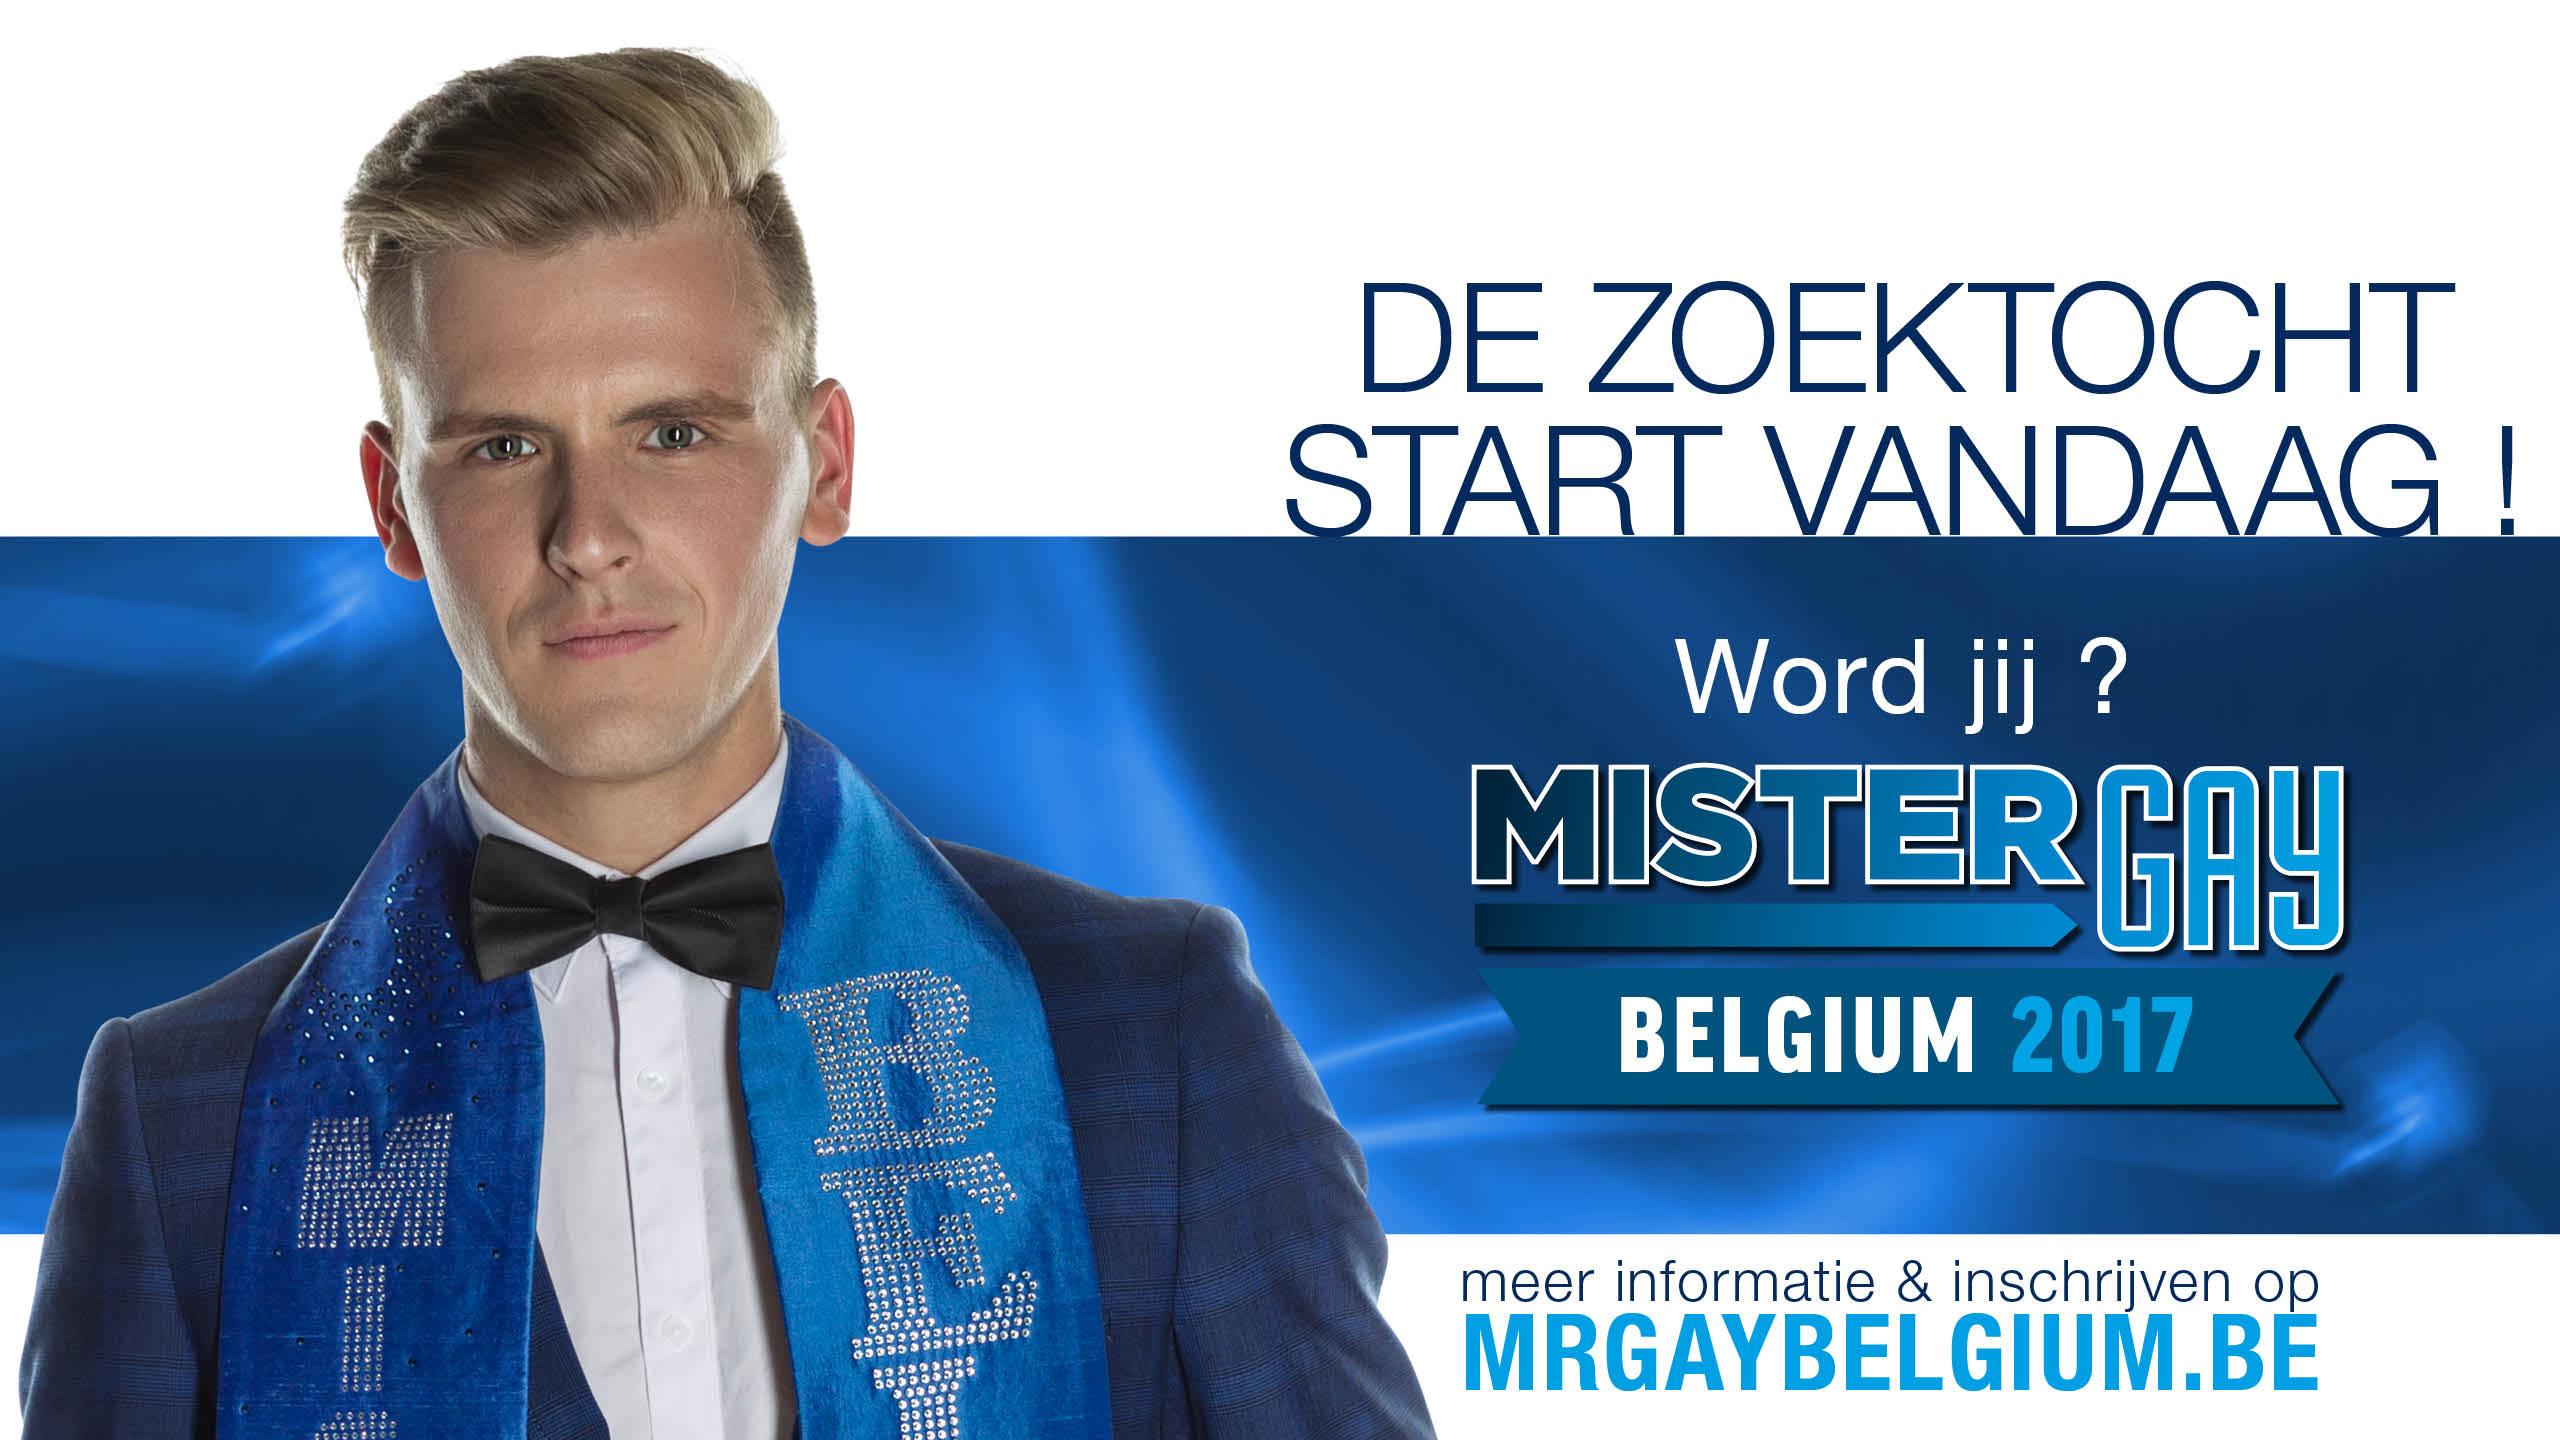 Gay Website wie m4sn